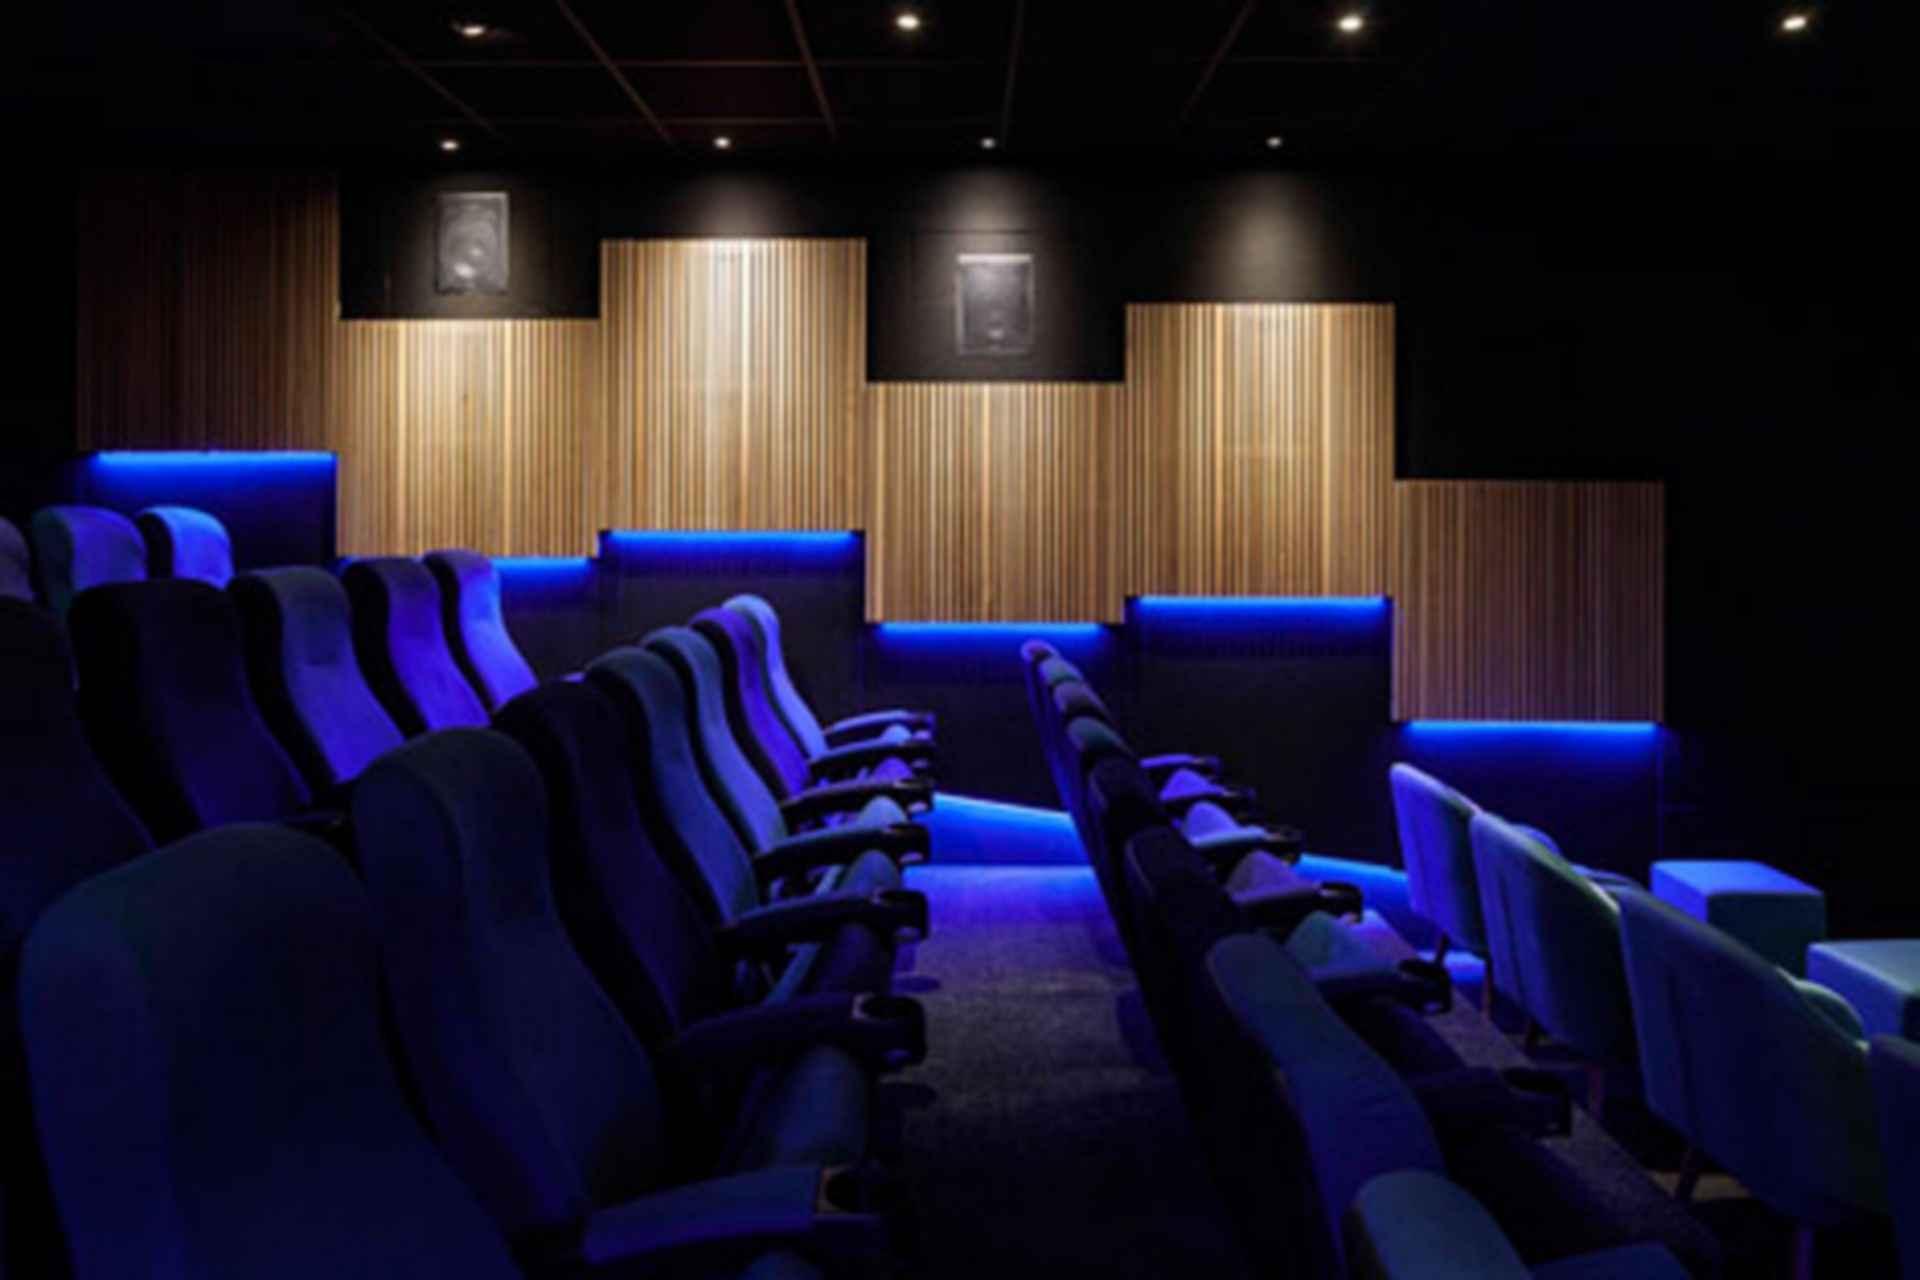 The Kino - blue theater